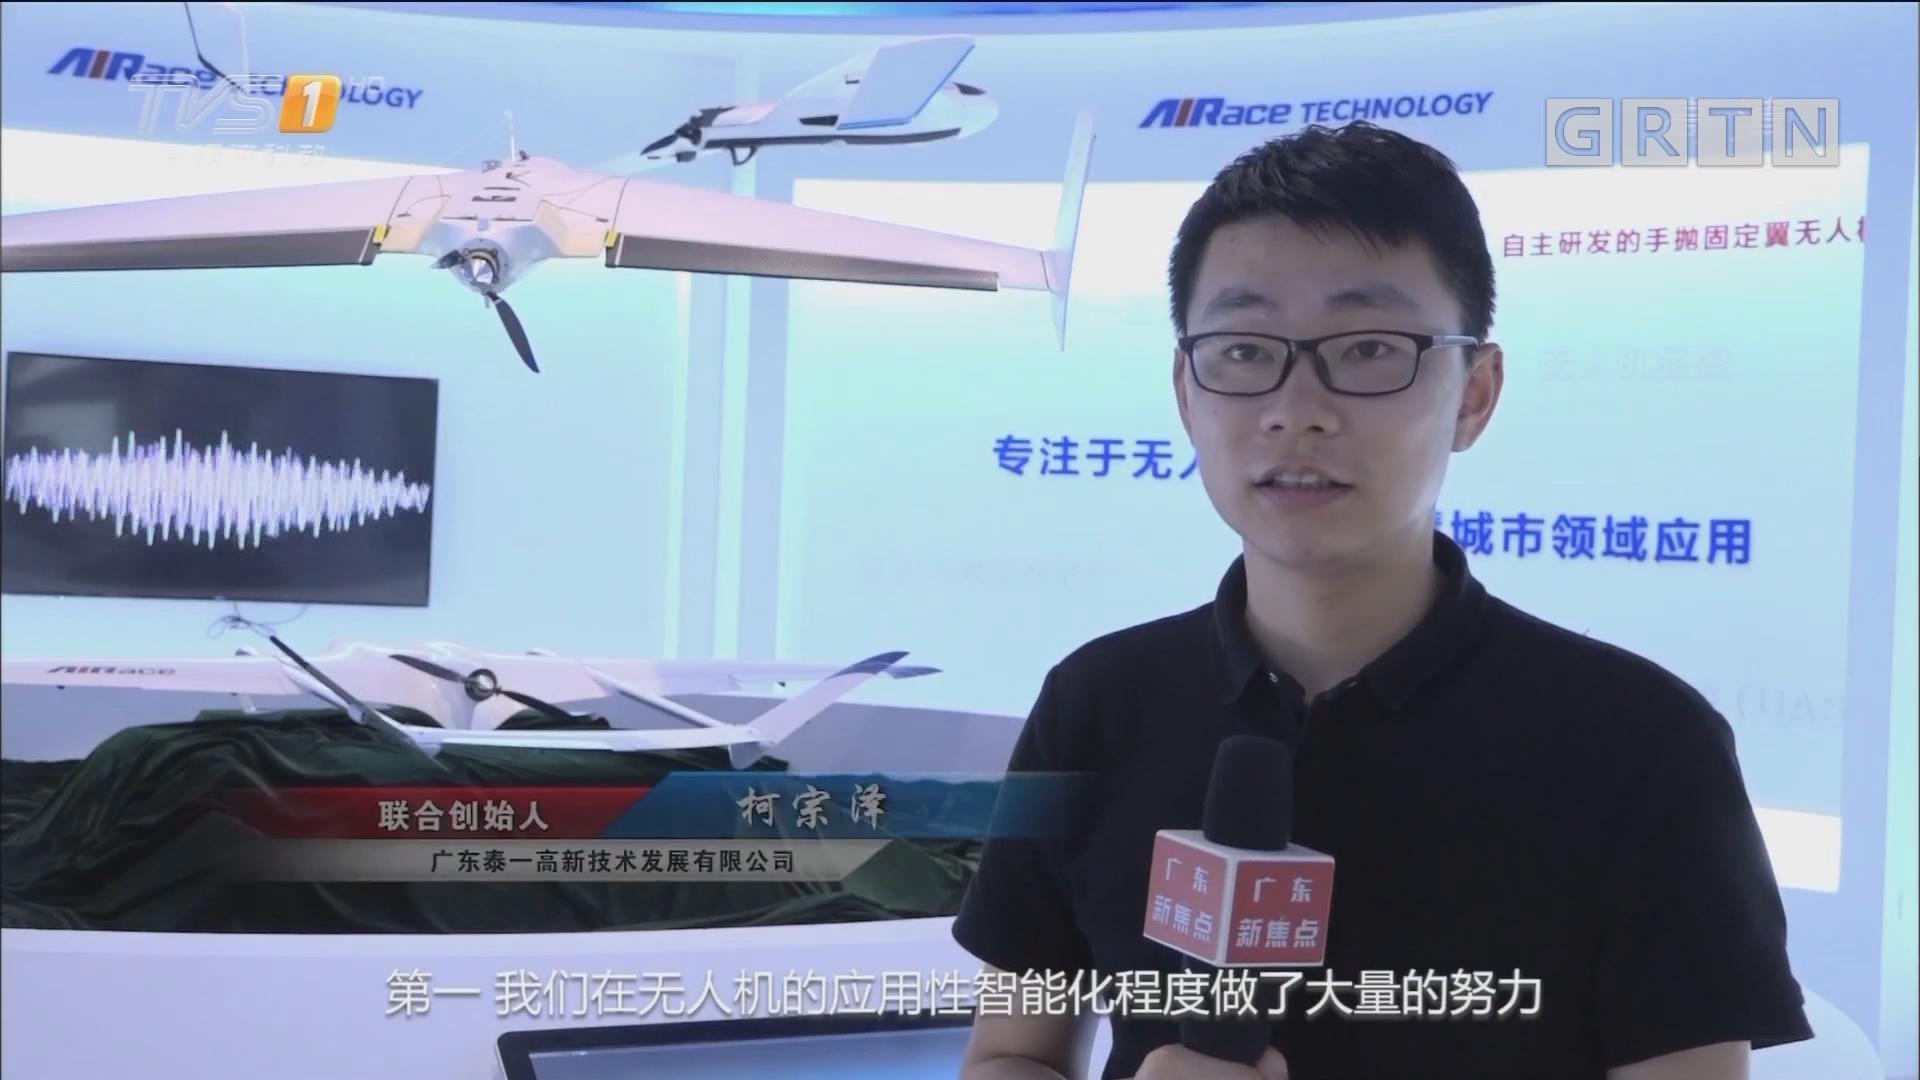 [HD][2018-12-15]广东新焦点:科技广东:广东泰一高新技术发展有限公司